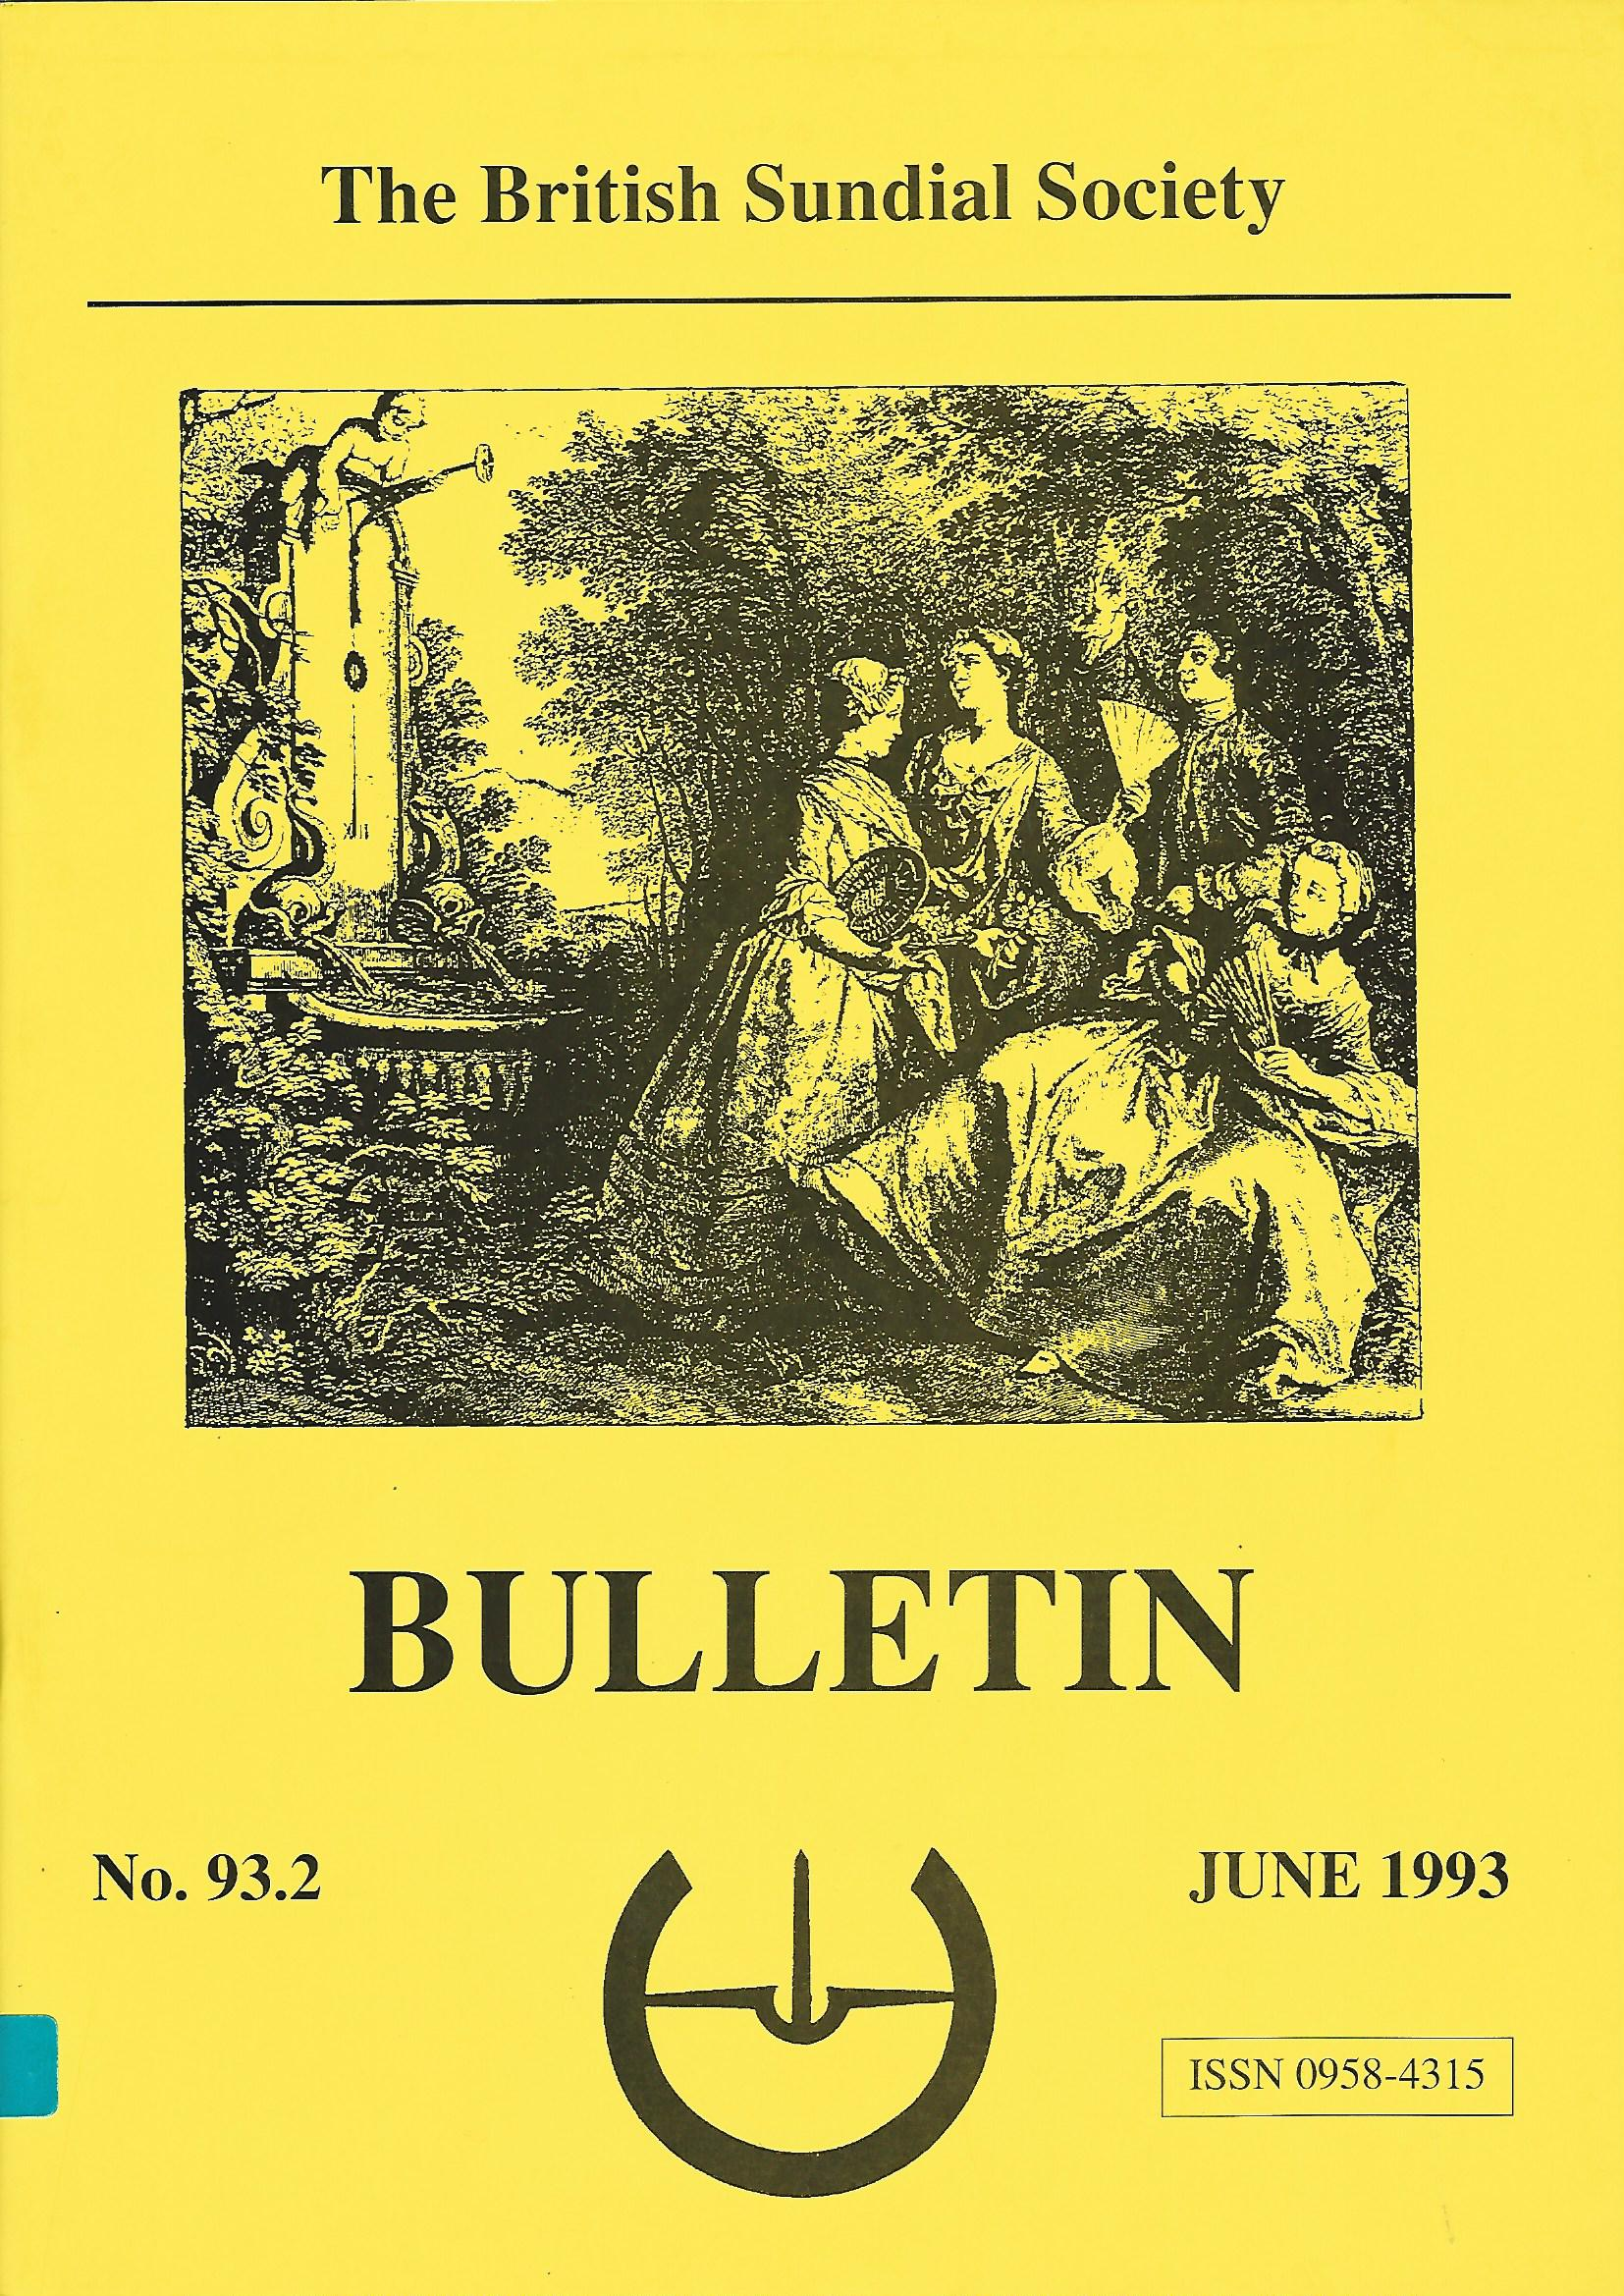 The British Sundial Society Bulletin No. 93.2, June 1993.